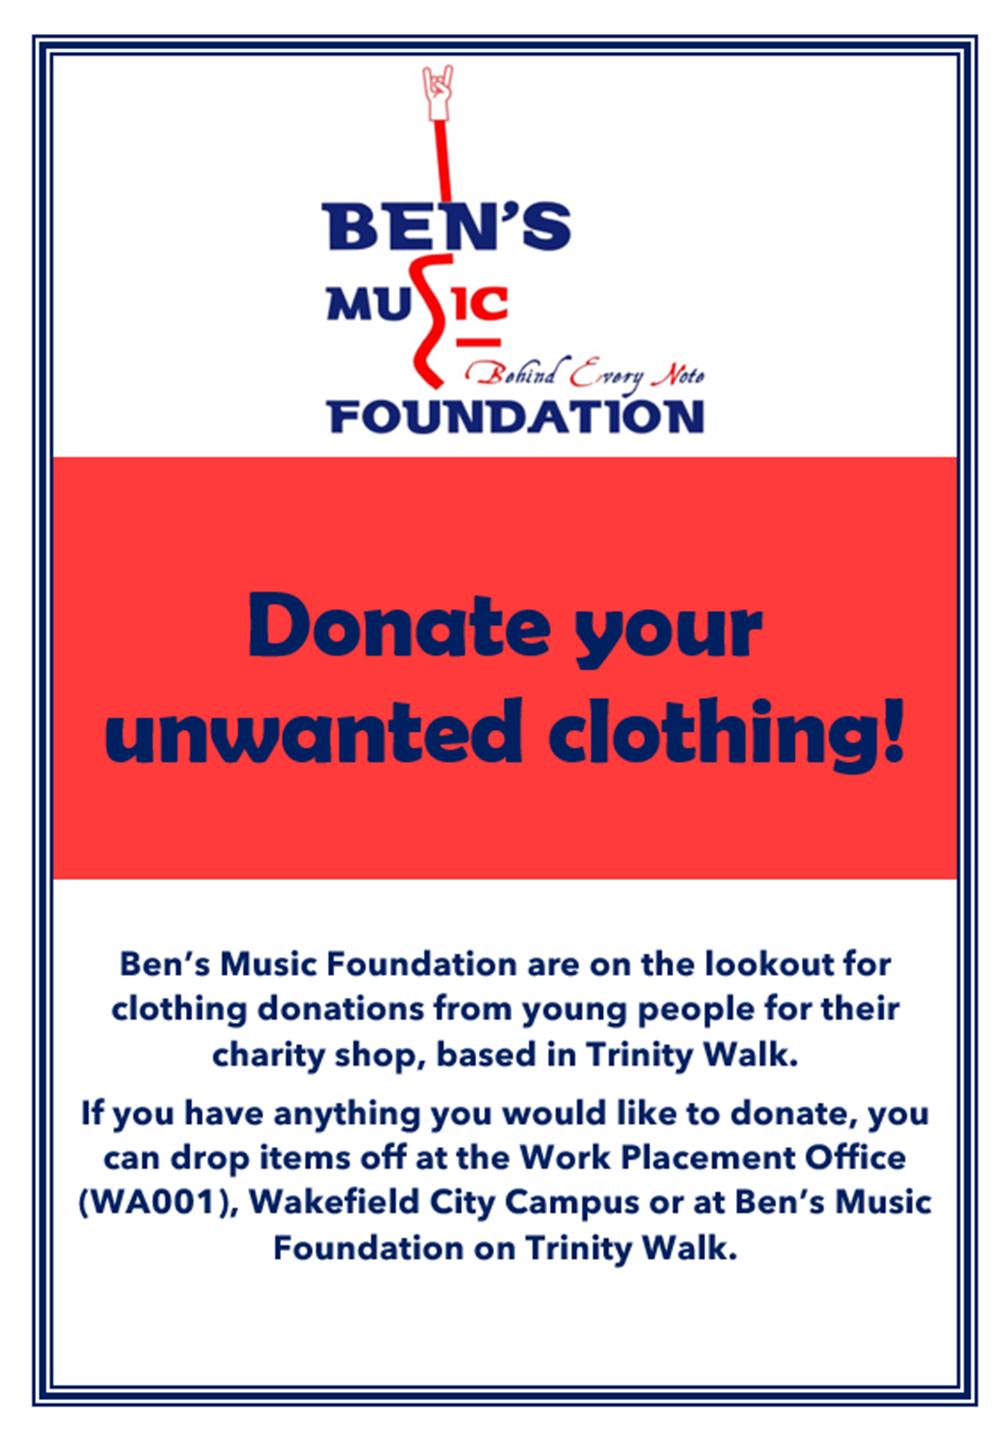 bens music foundation